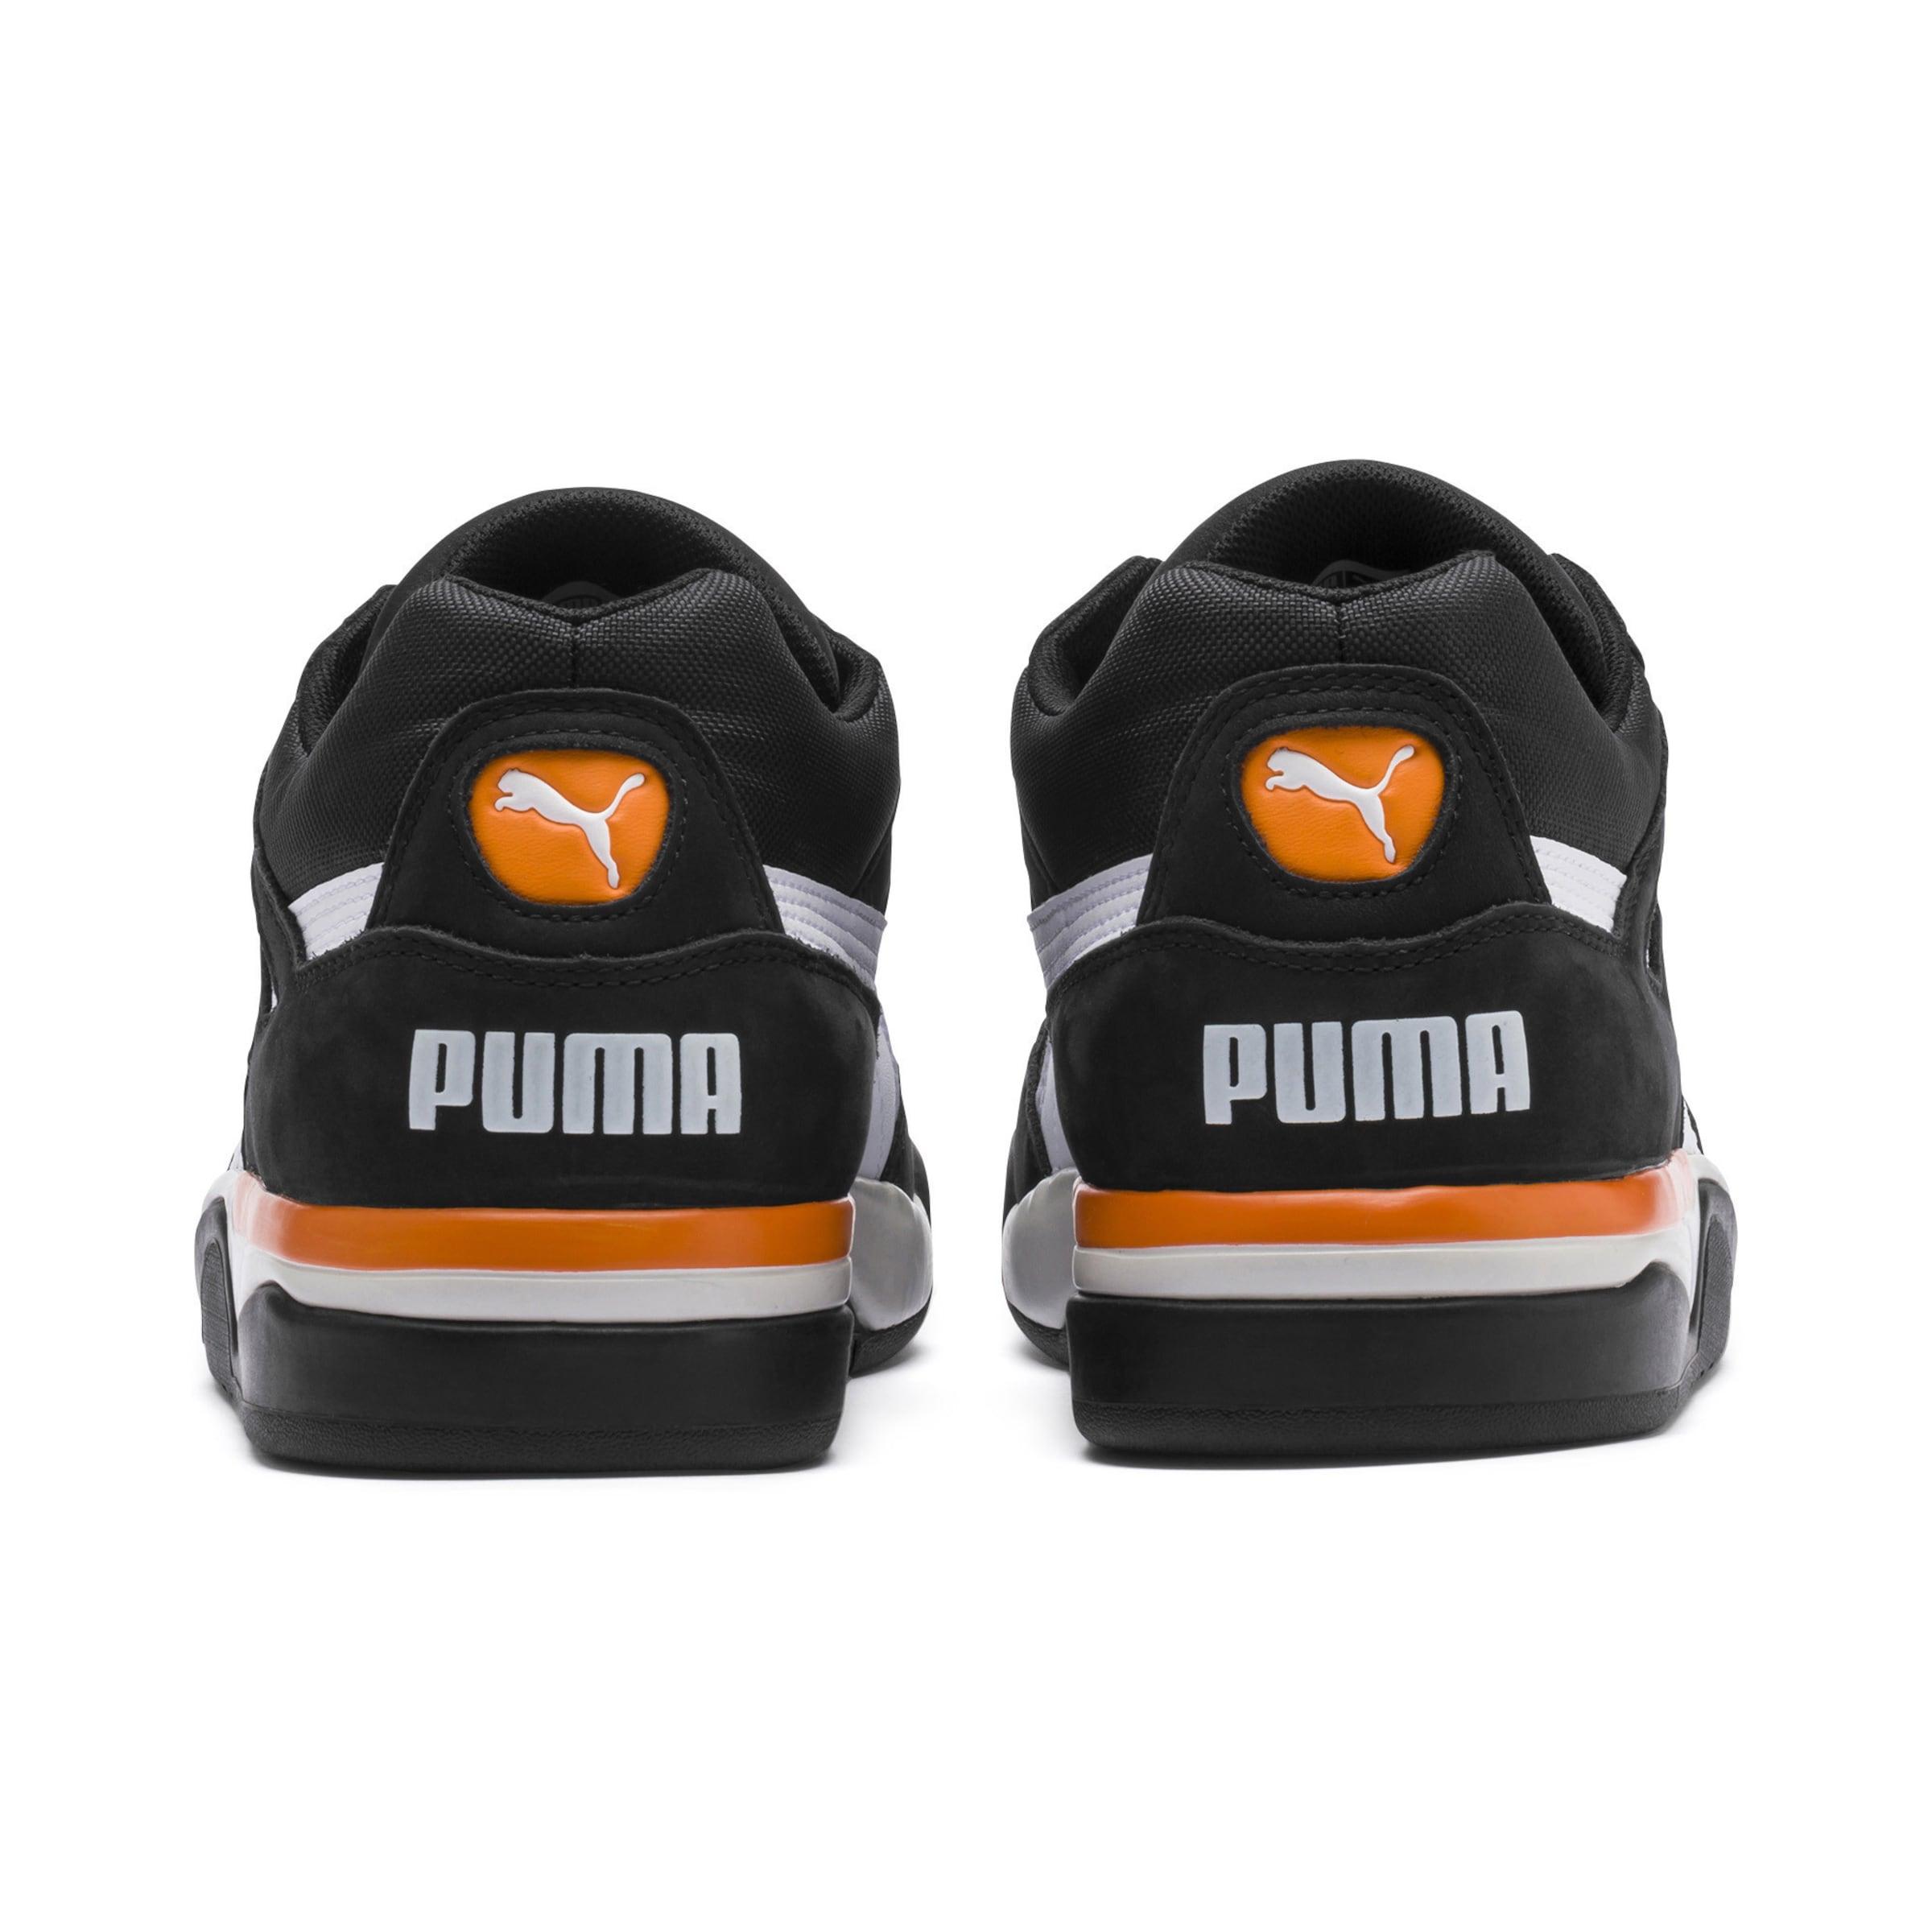 In Puma Guard' OrangeSchwarz Weiß 'palace Sneaker 53RAjq4L